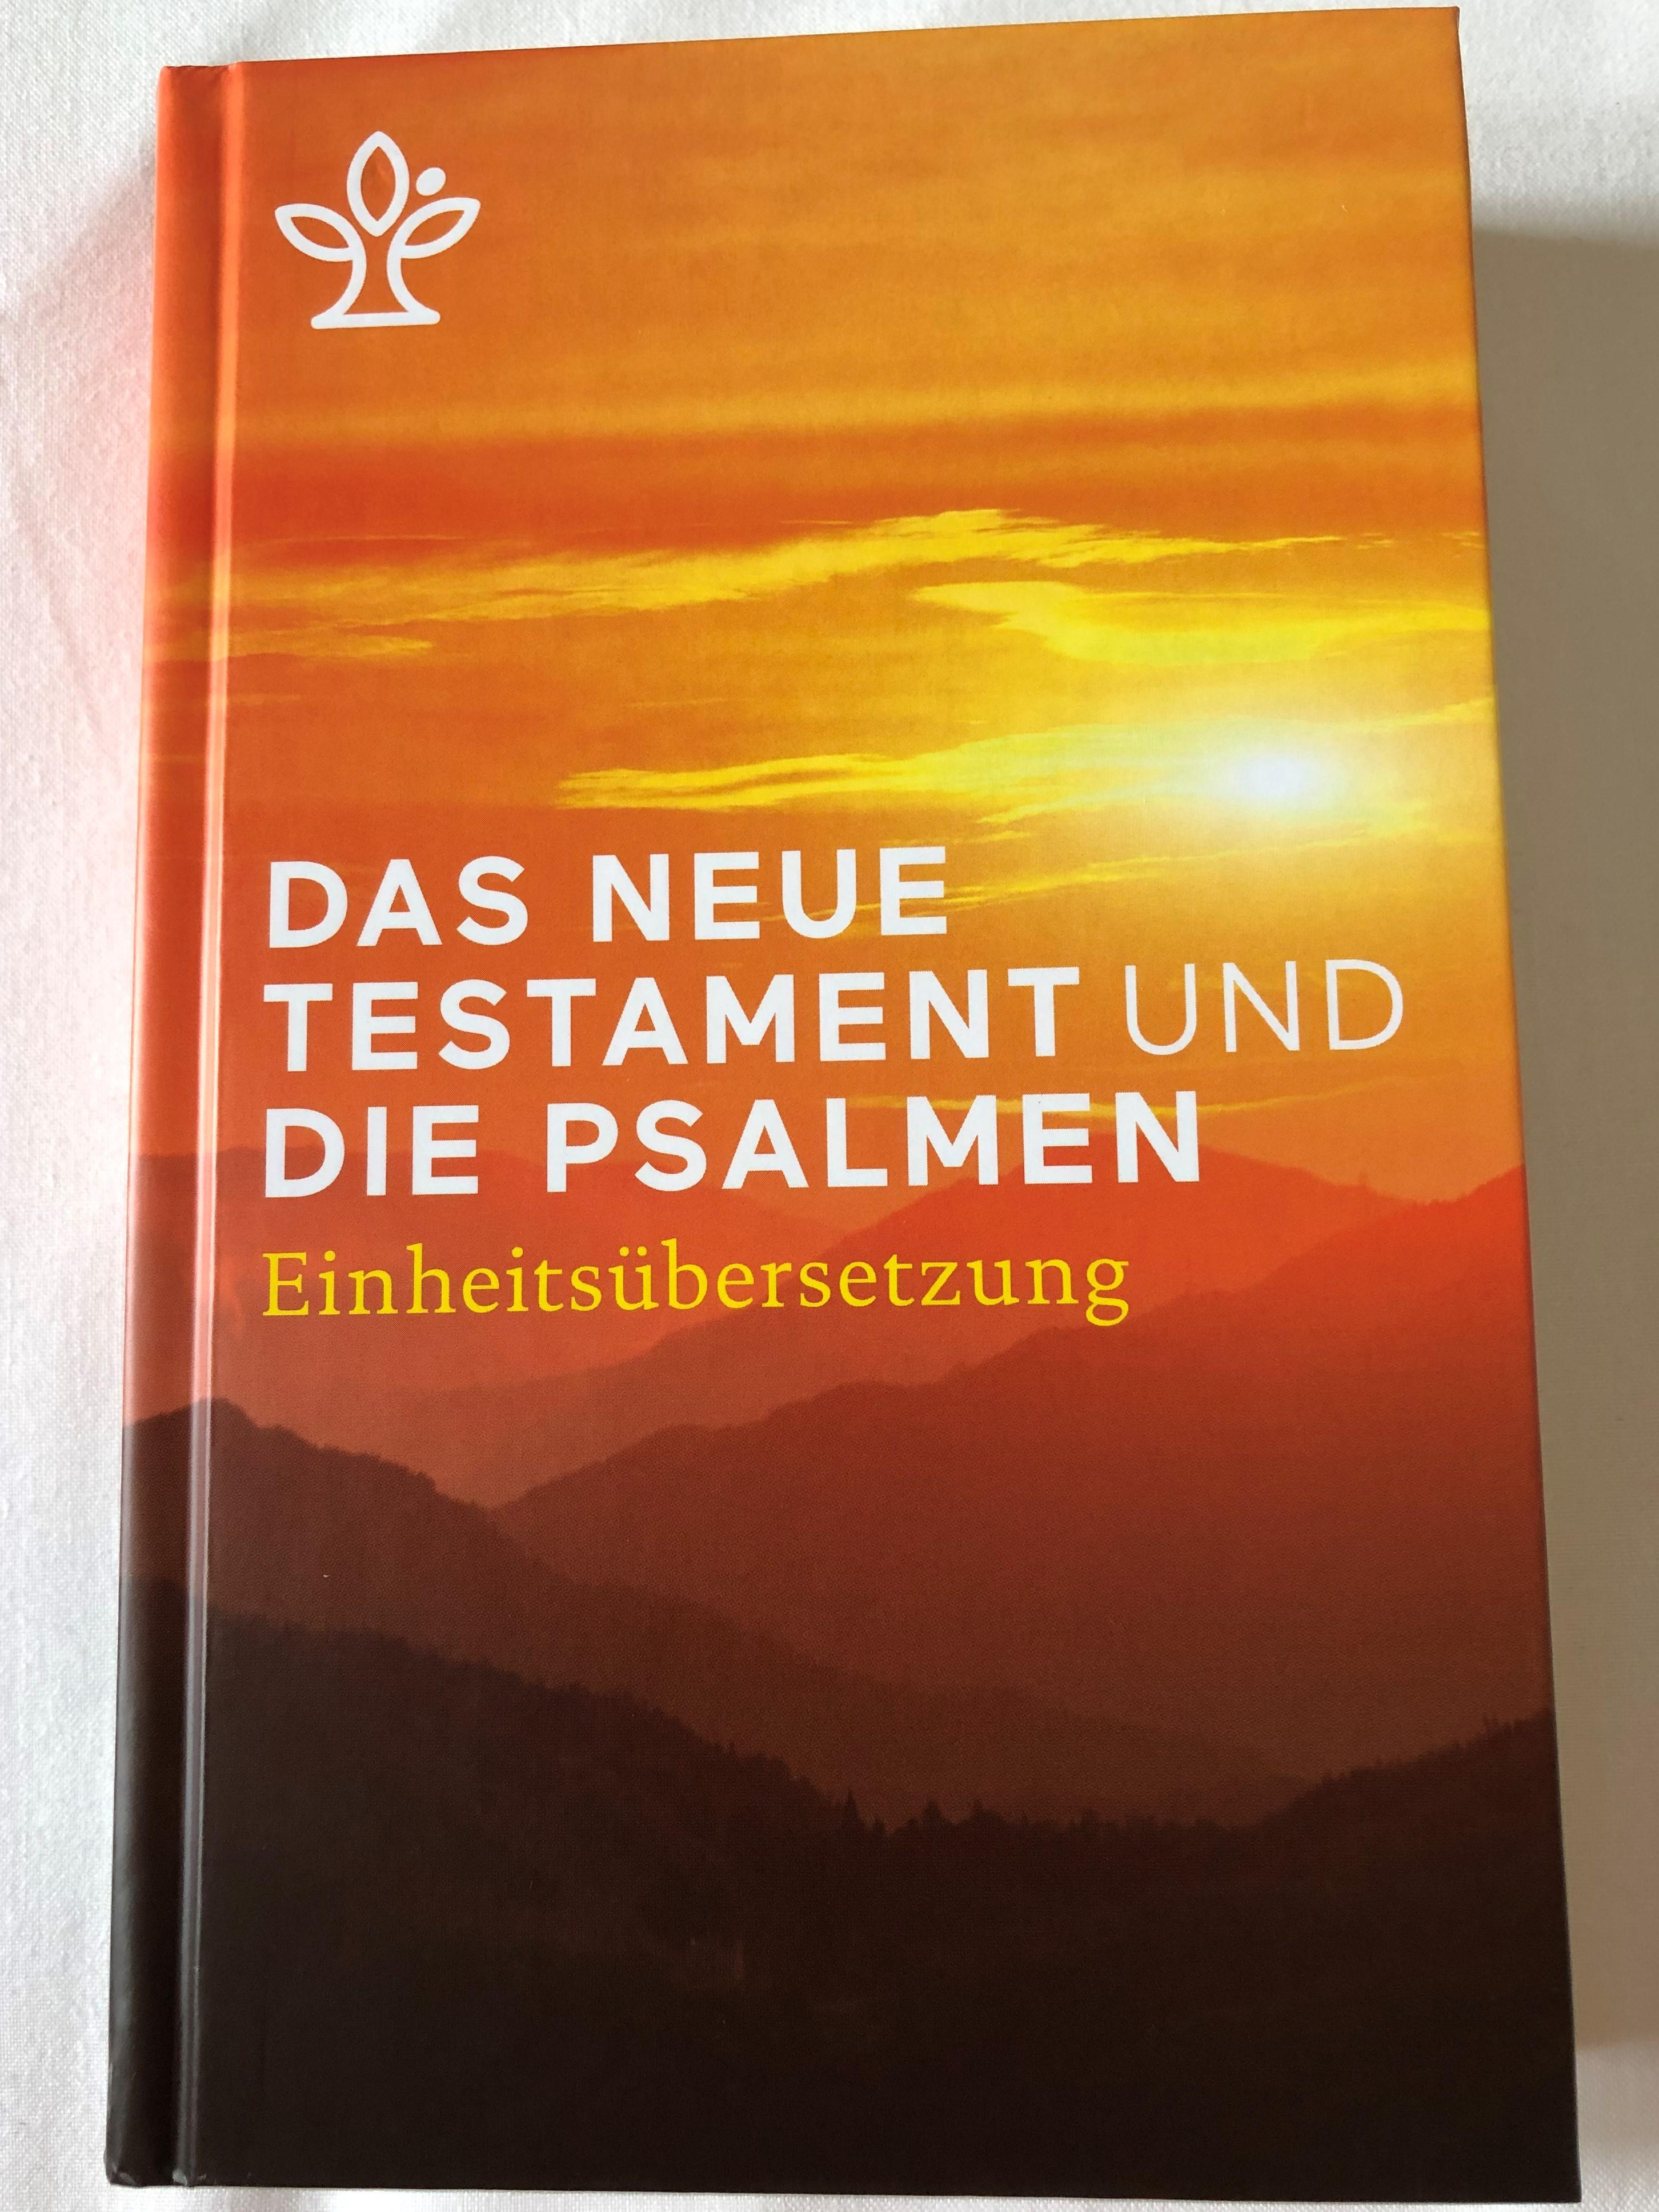 das-neue-testament-und-die-psalmen-einheits-bersetzung-german-language-new-testament-and-psalms-unitary-translation-book-introductions-references-notes-and-maps-hardcover-2018-kbw-1-.jpg